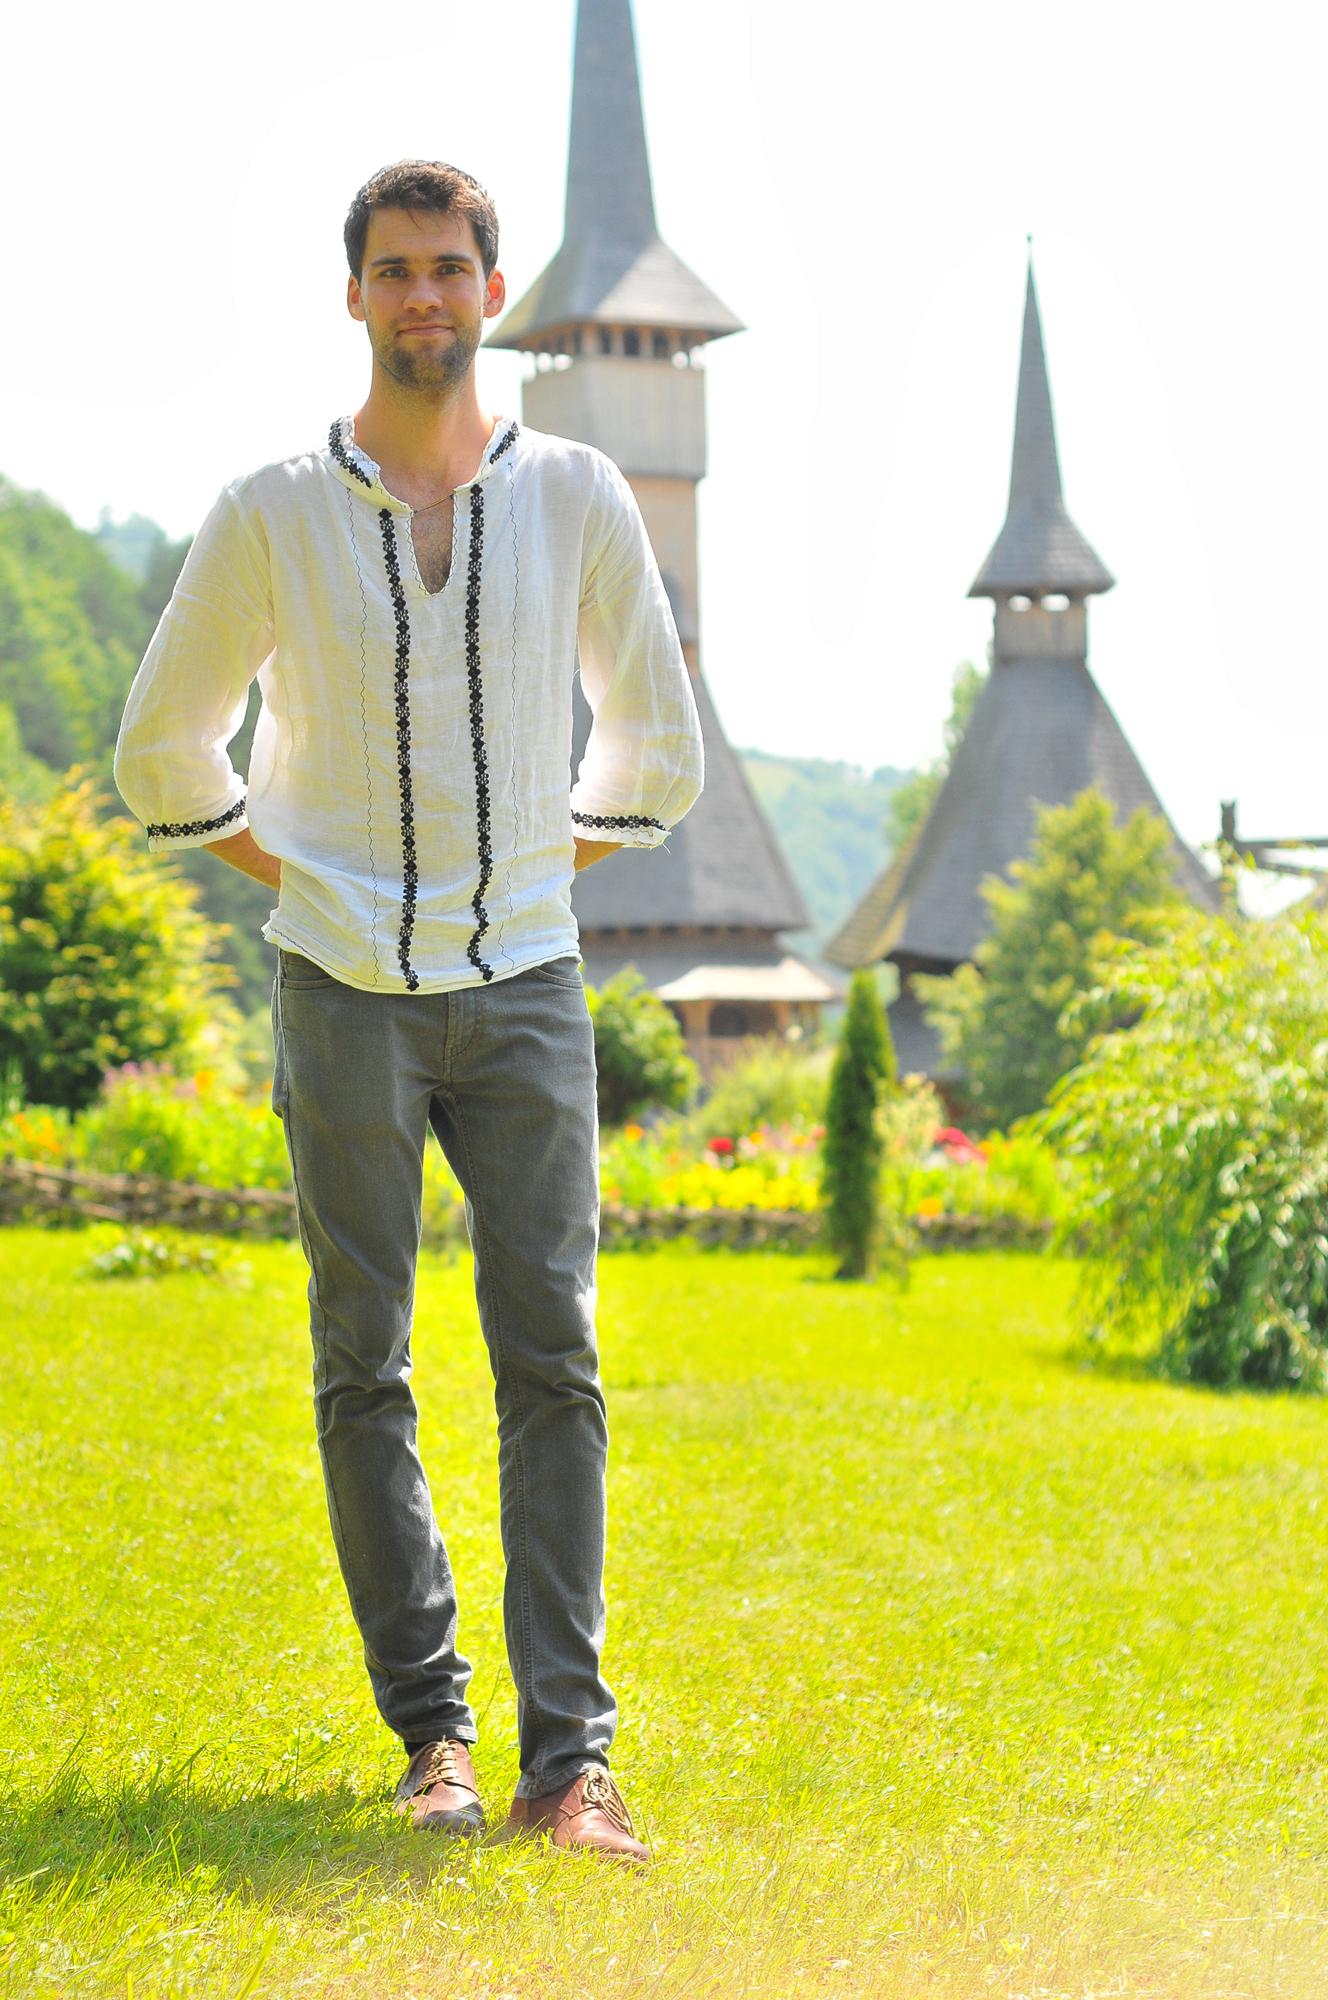 Iulian Soca, ghid de turism, contact@socatour.ro